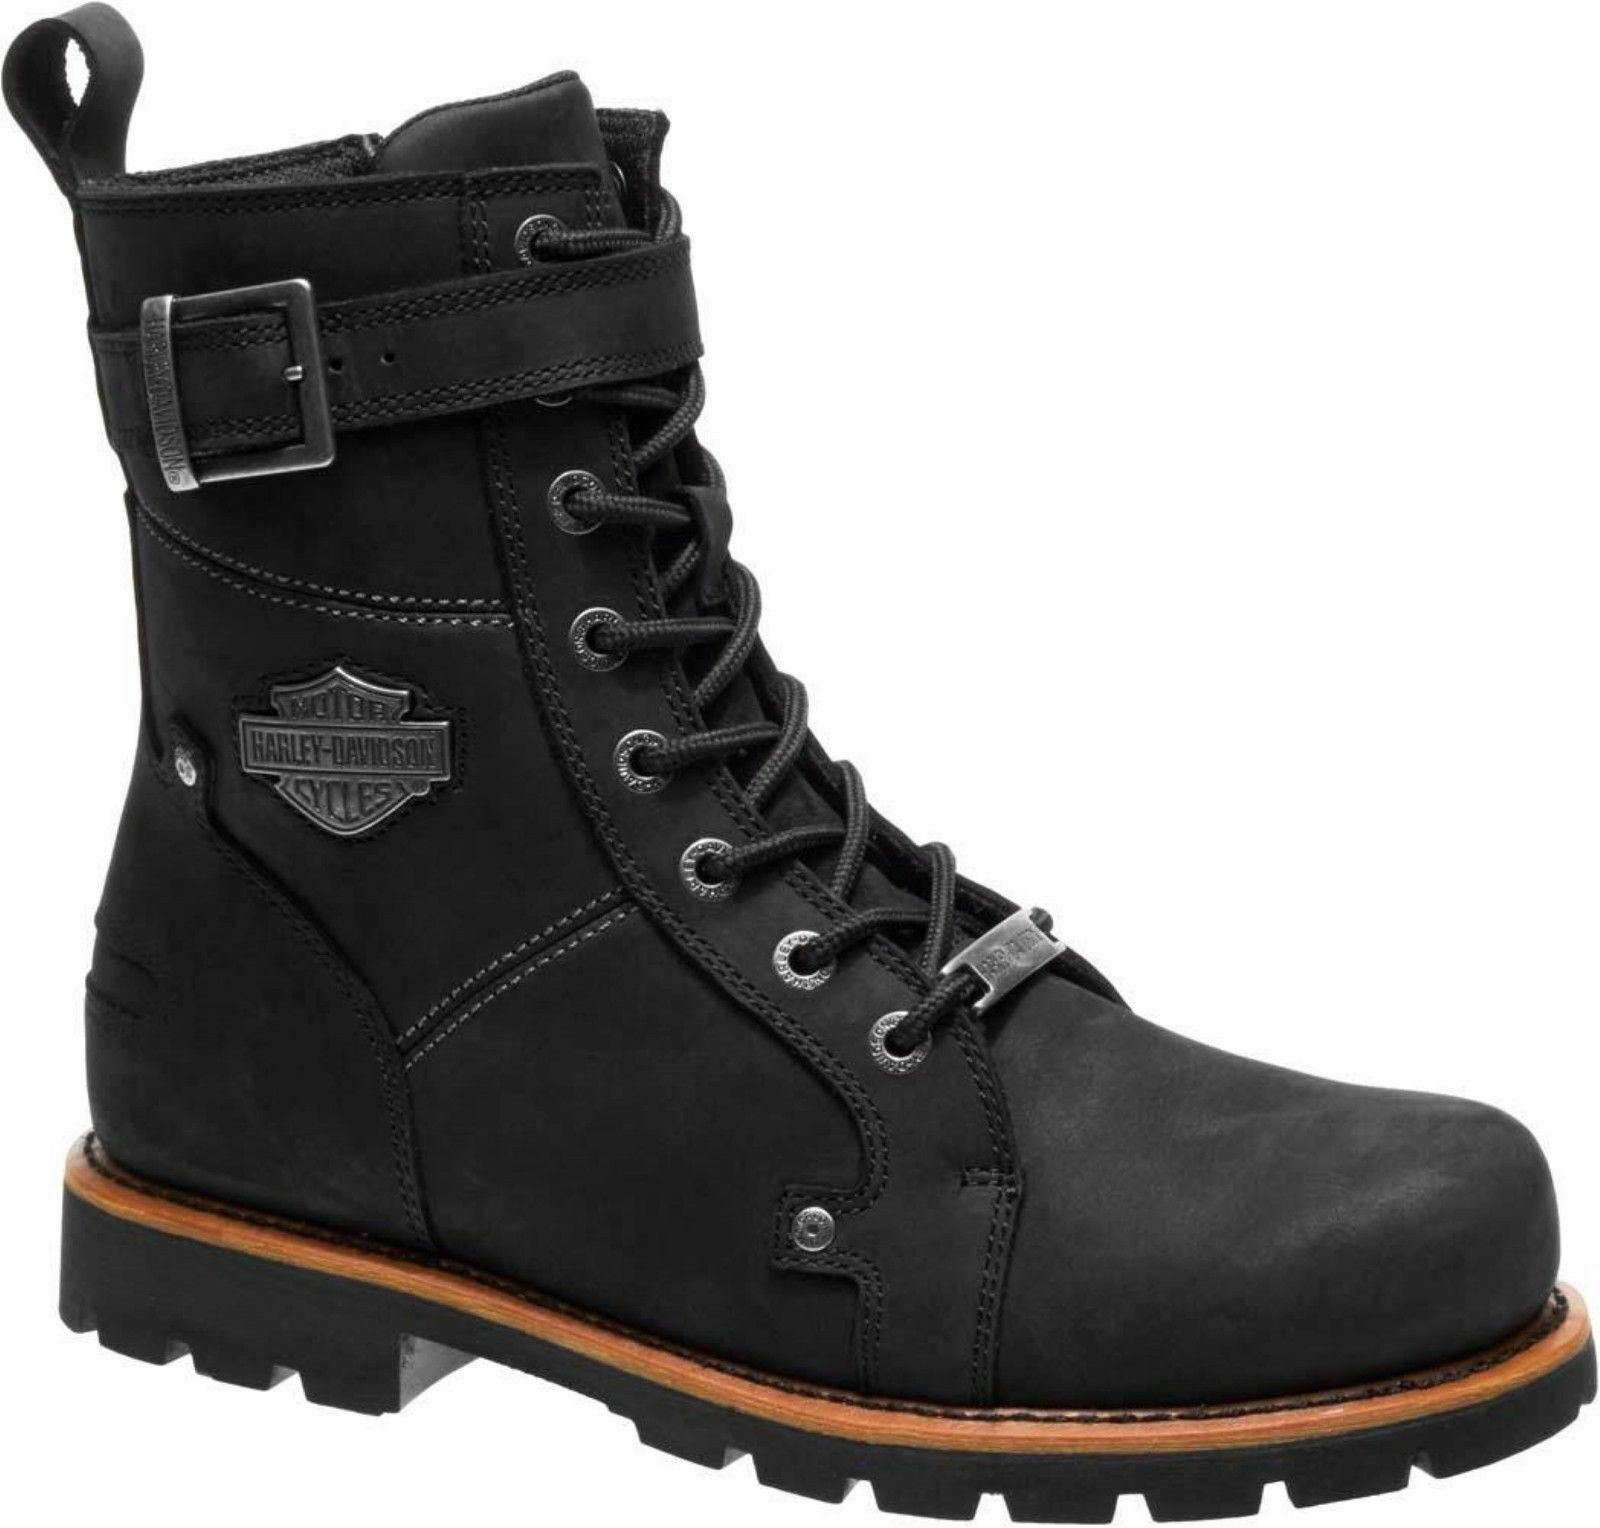 Harley Davidson WICKSON  Hombre Negro Buckles Leather Biker botas Rock Buckles Negro Lace Up c0d975